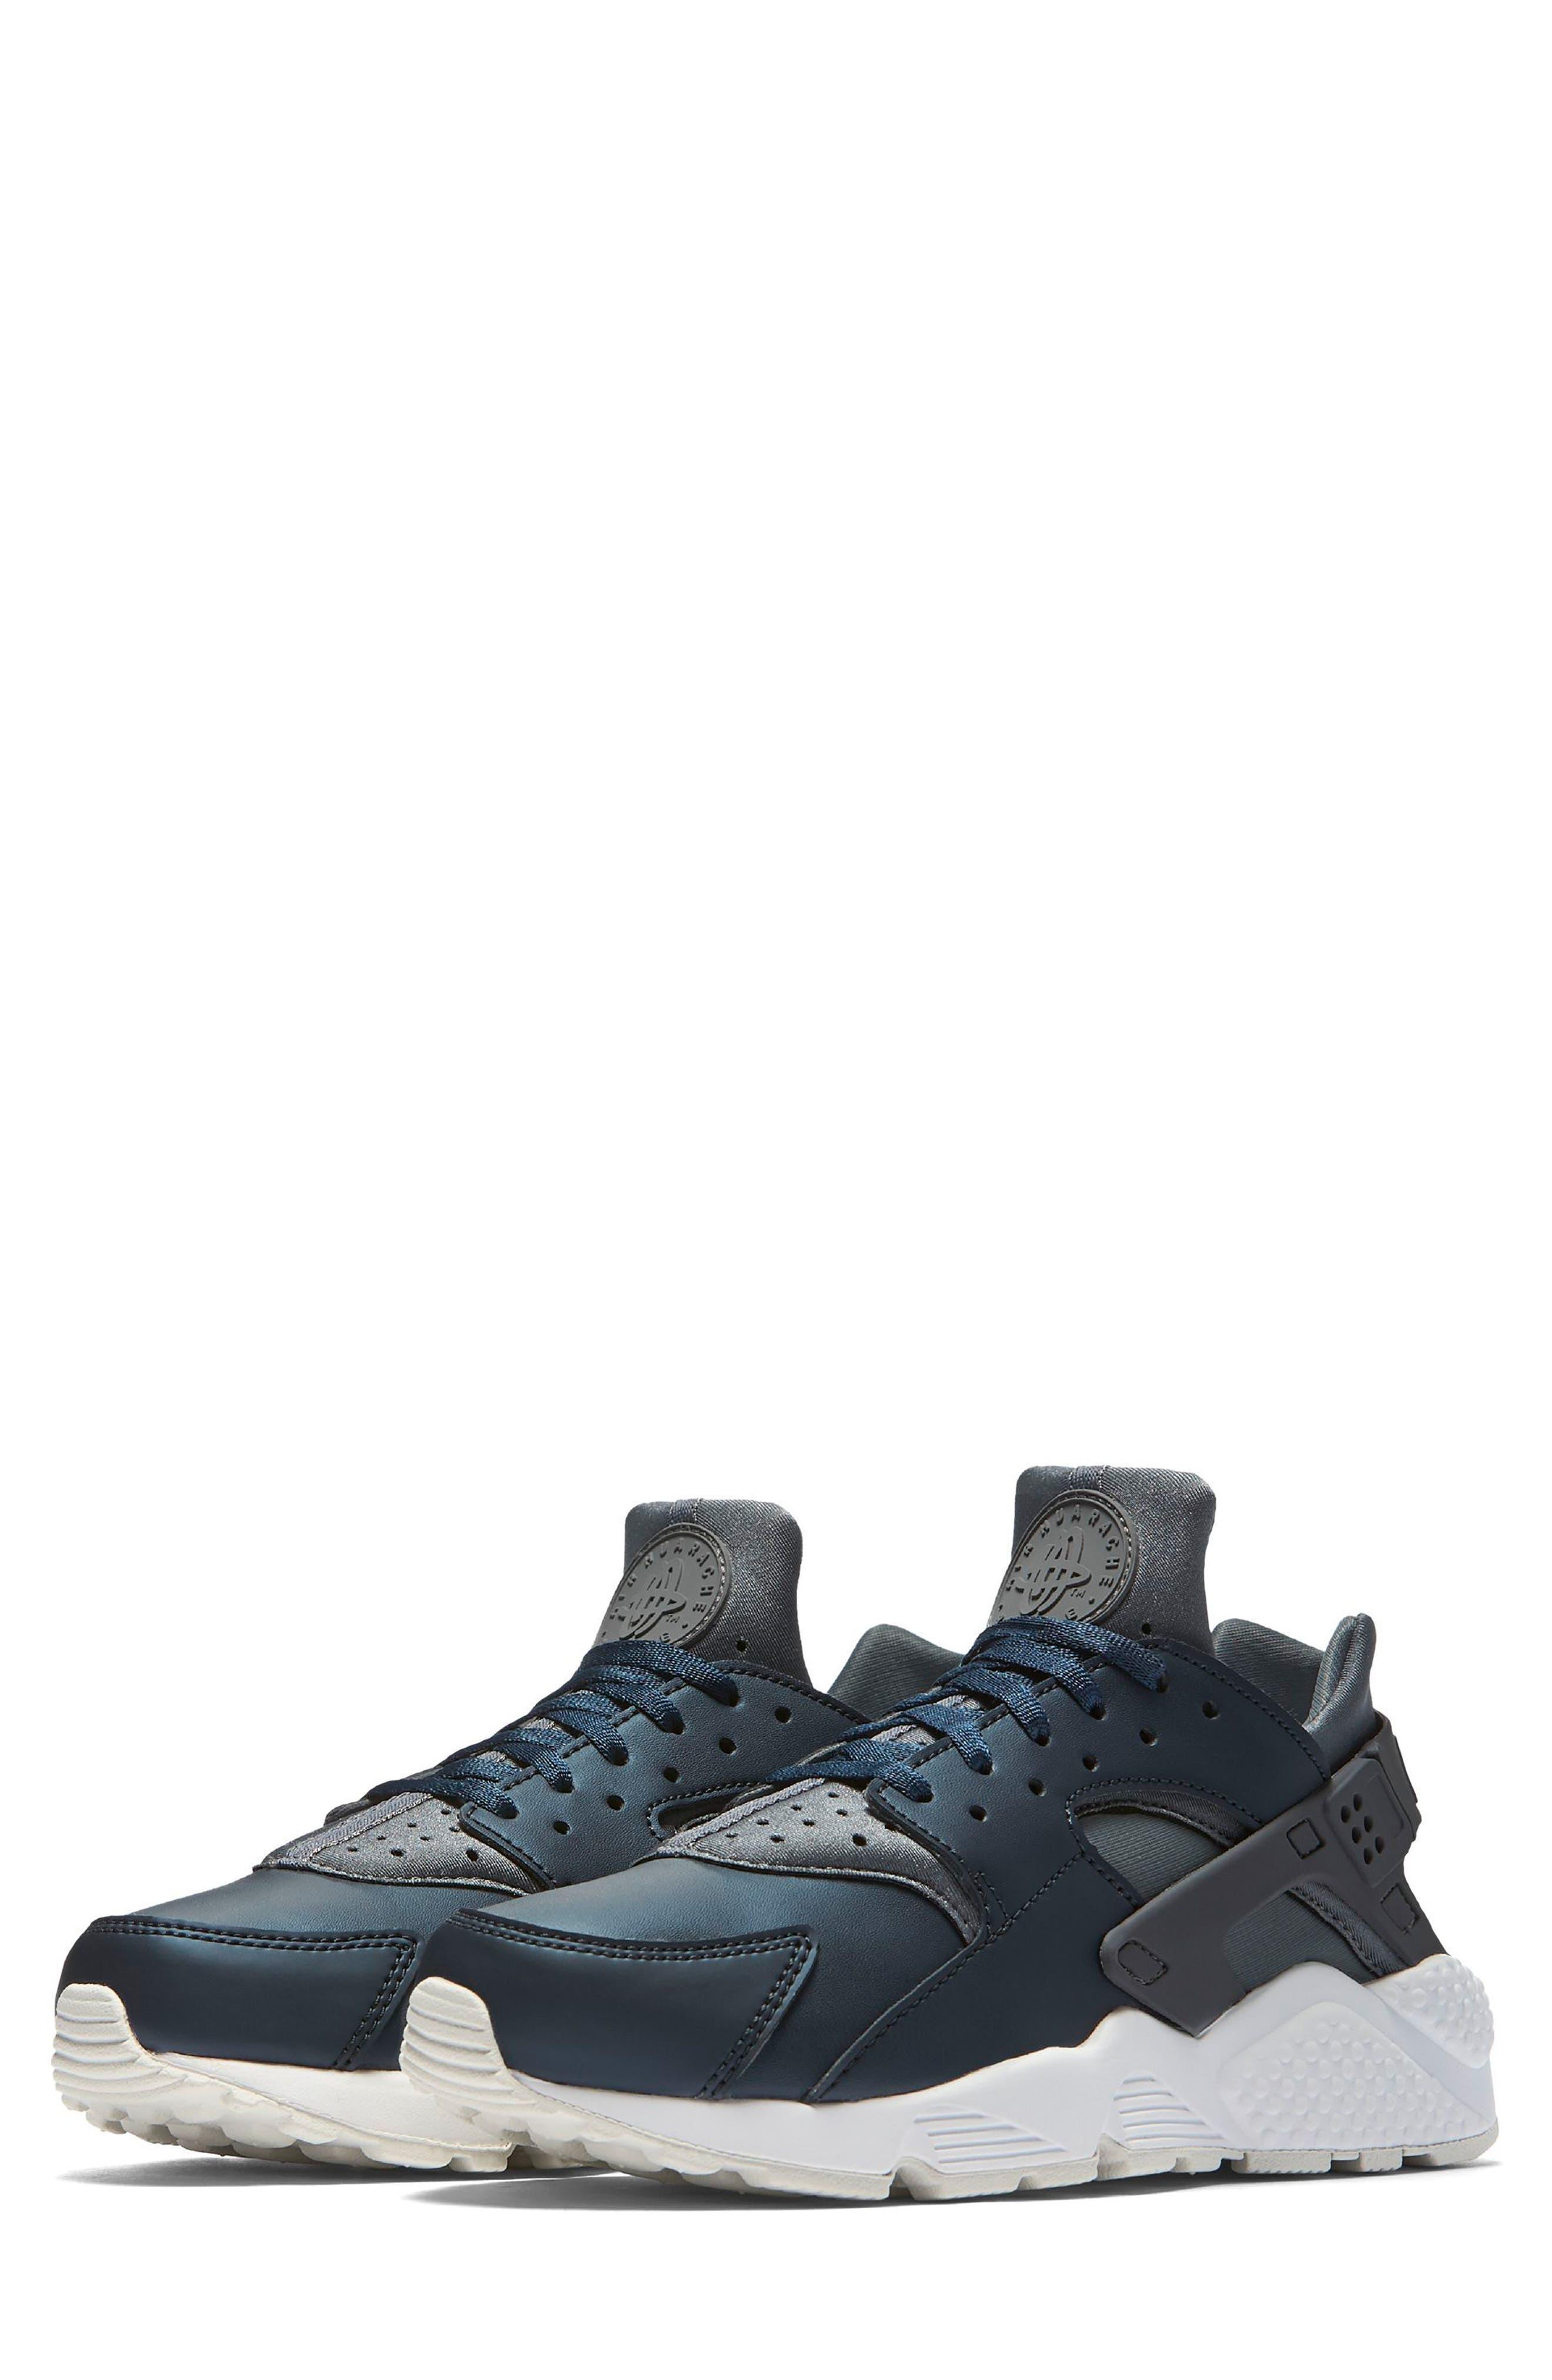 Alternate Image 1 Selected - Nike Air Huarache Run Premium Sneaker (Women)